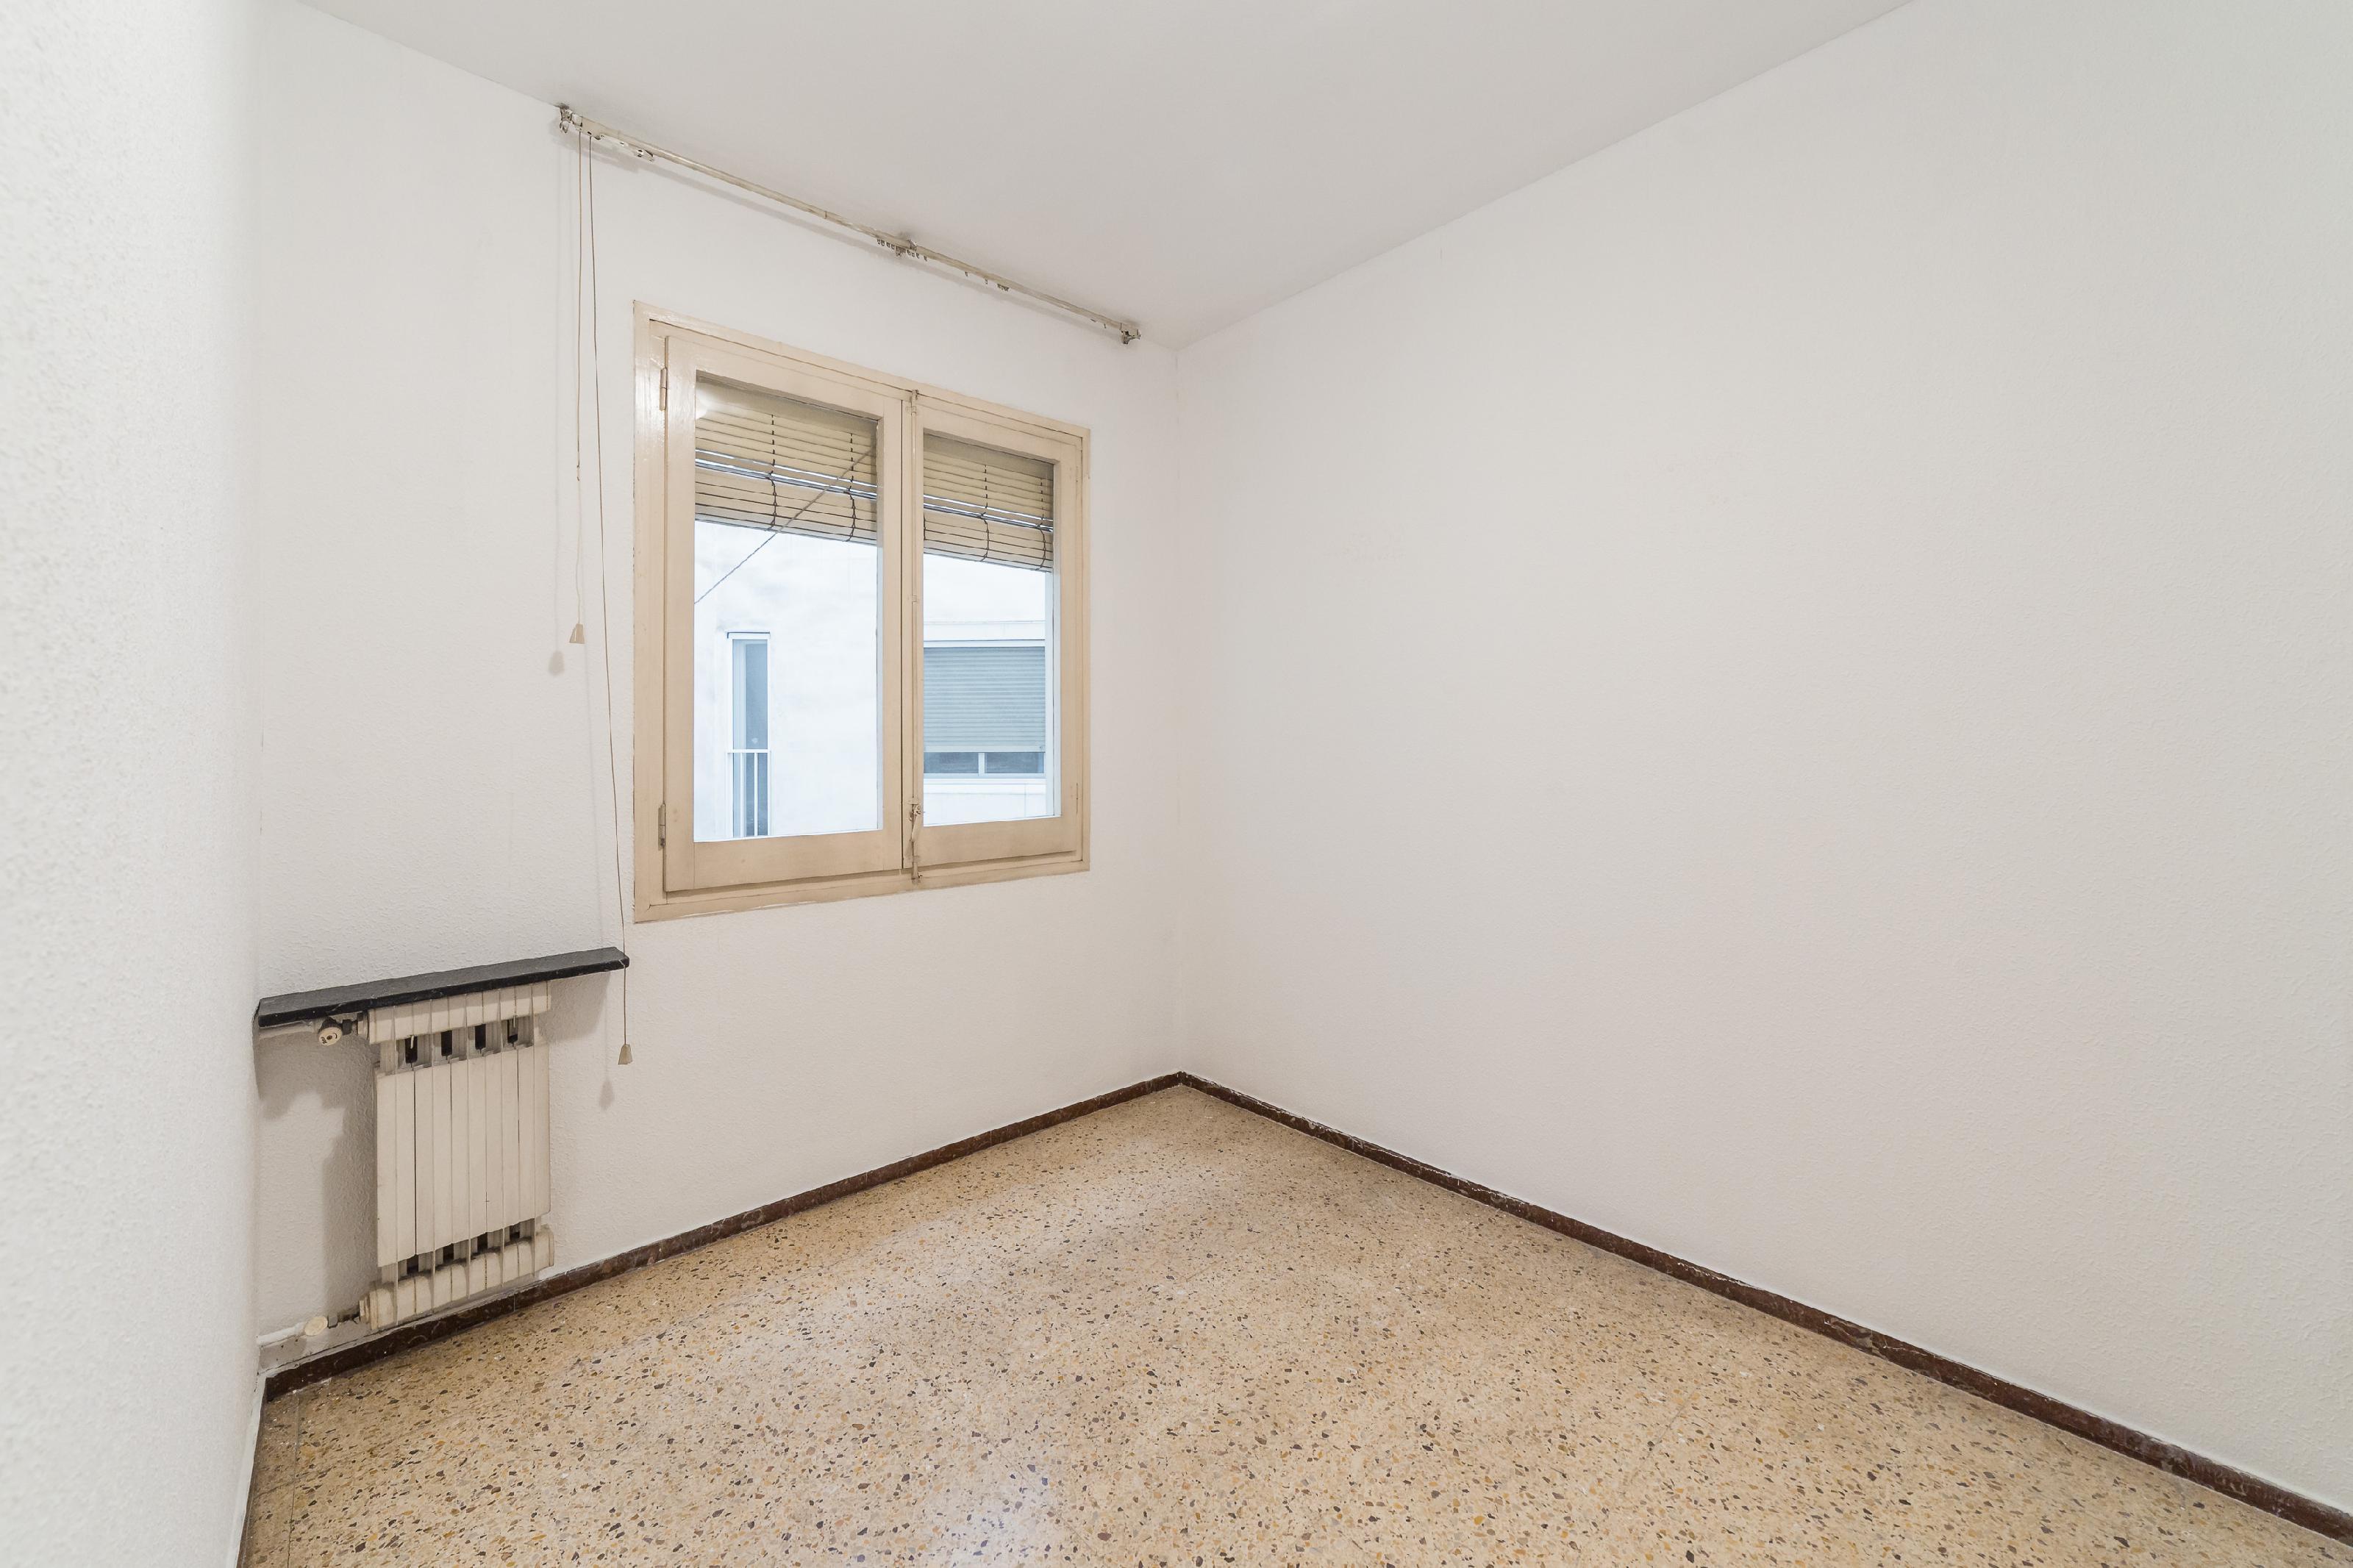 247624 Flat for sale in Eixample, Sant Antoni 19